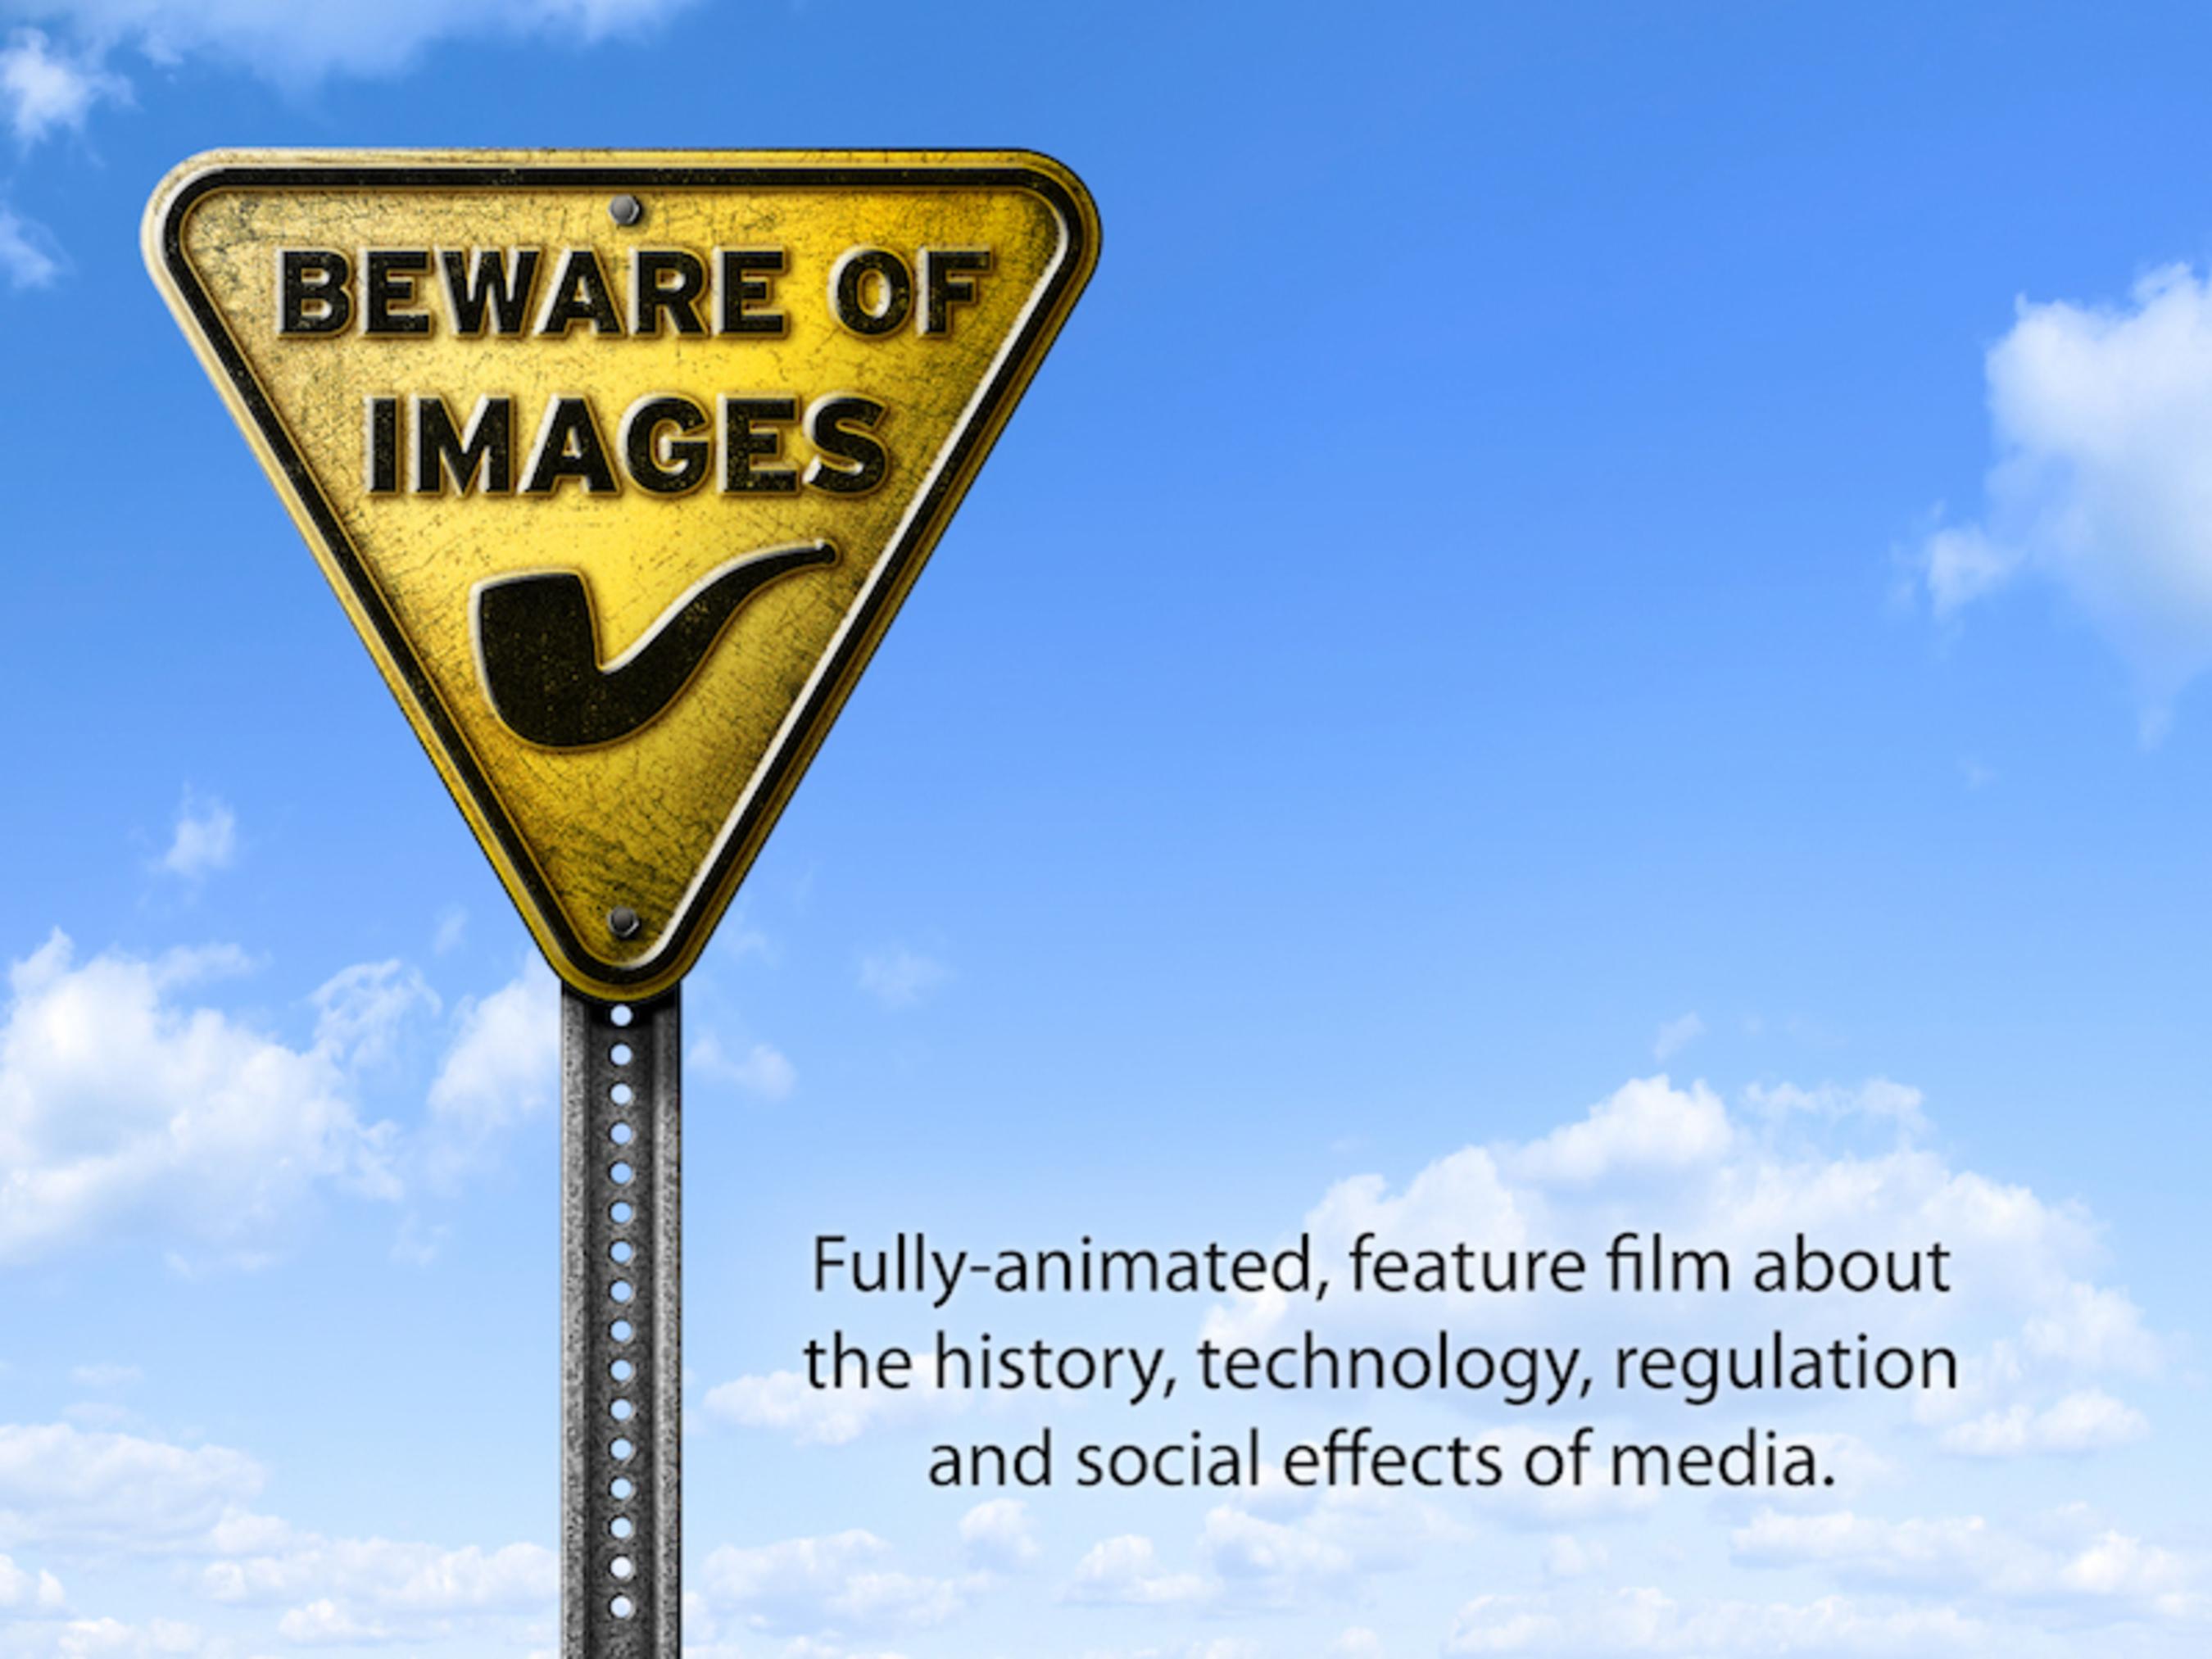 Beware of Images by Sergio Toporek (PRNewsFoto/Beware of Images)